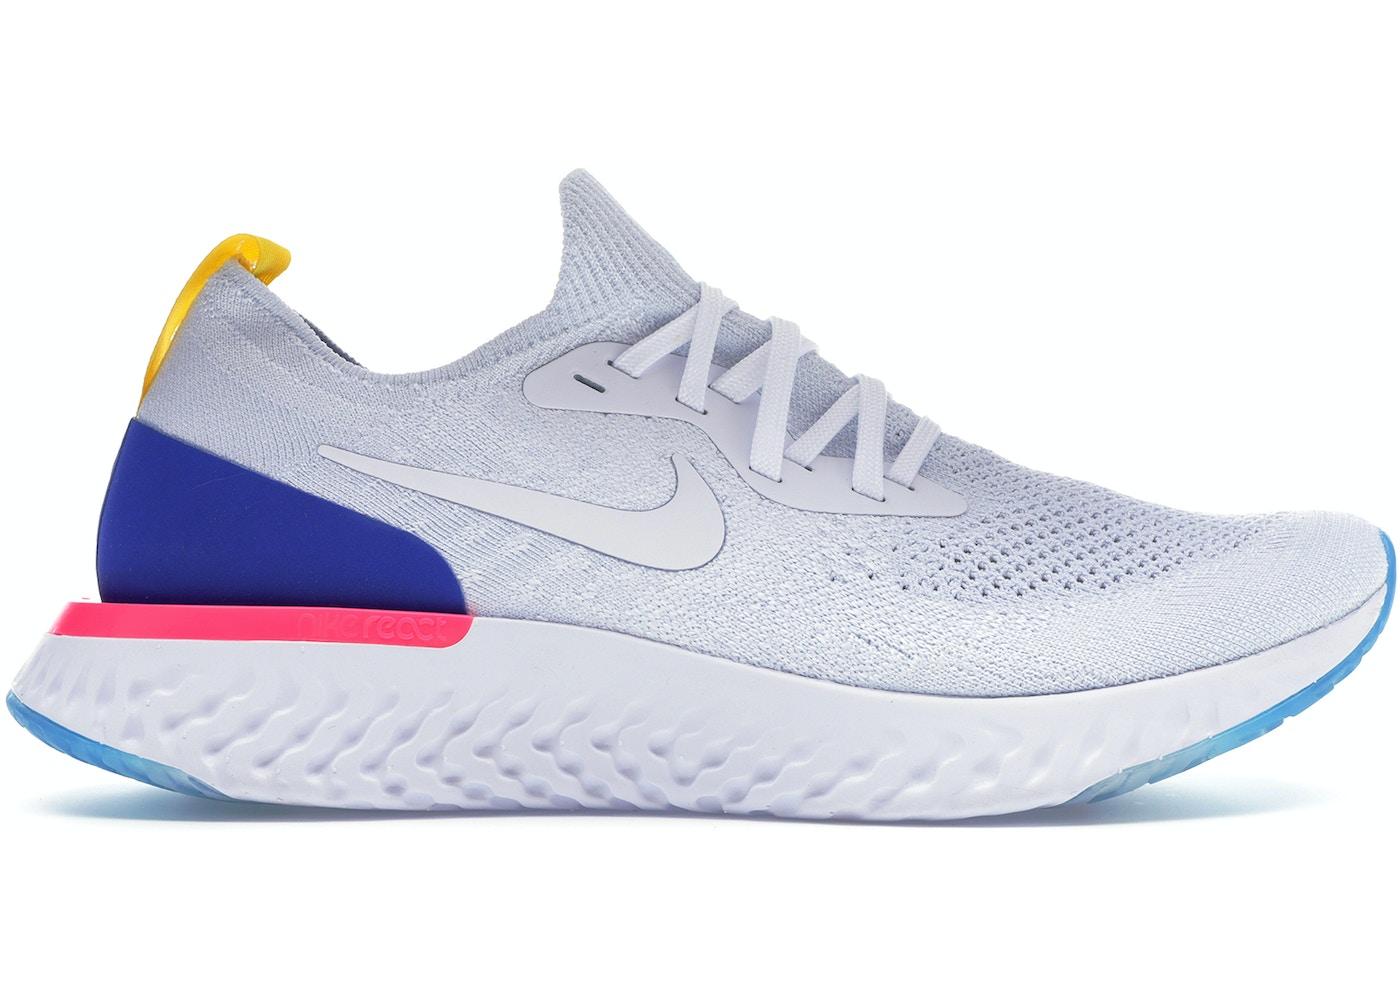 e11903869f1a Nike Epic React Flyknit White Racer Blue Pink Blast - AQ0067-101